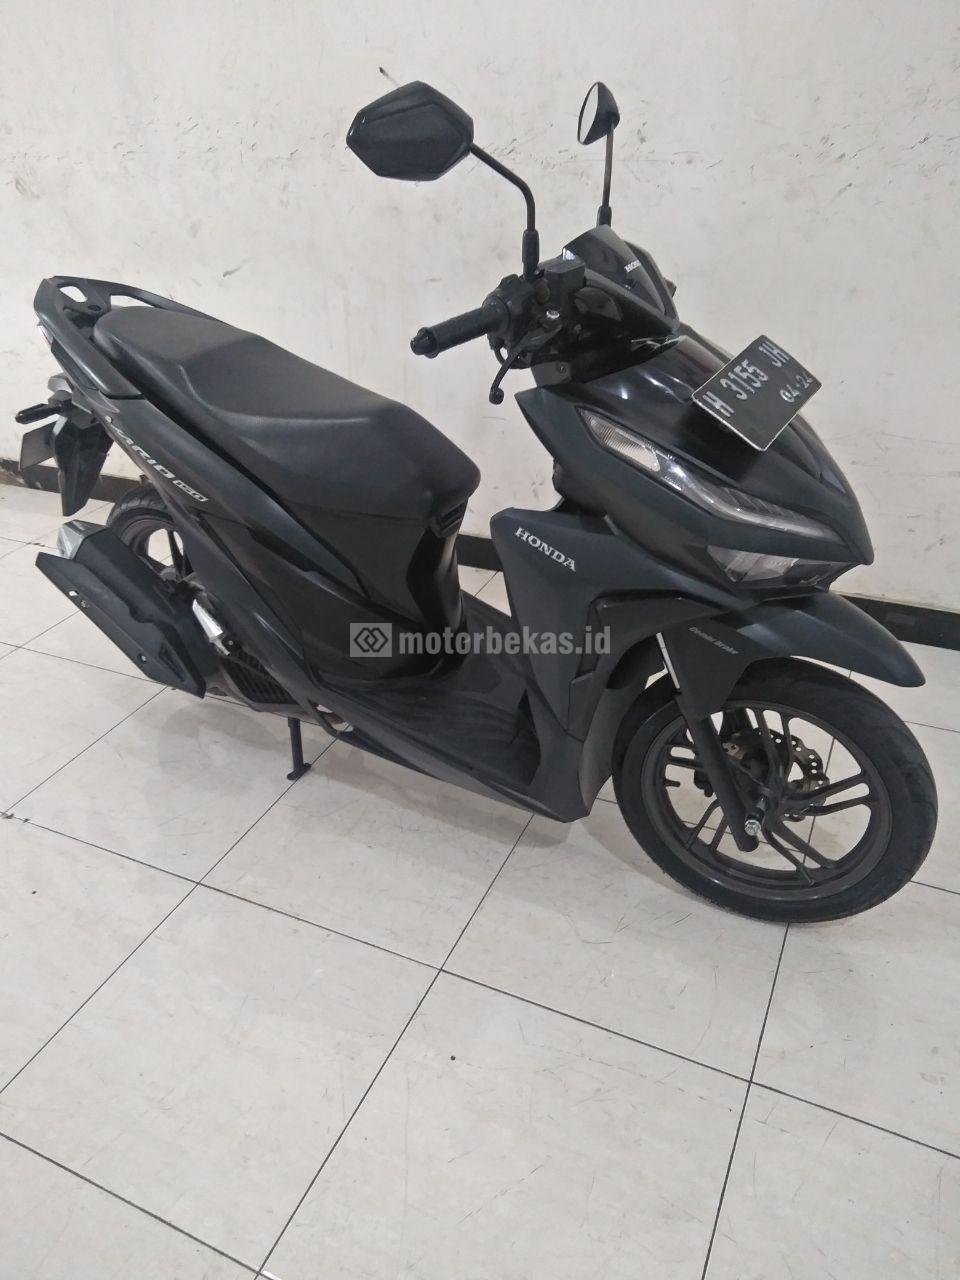 HONDA VARIO 150 SPORTY  3452 motorbekas.id